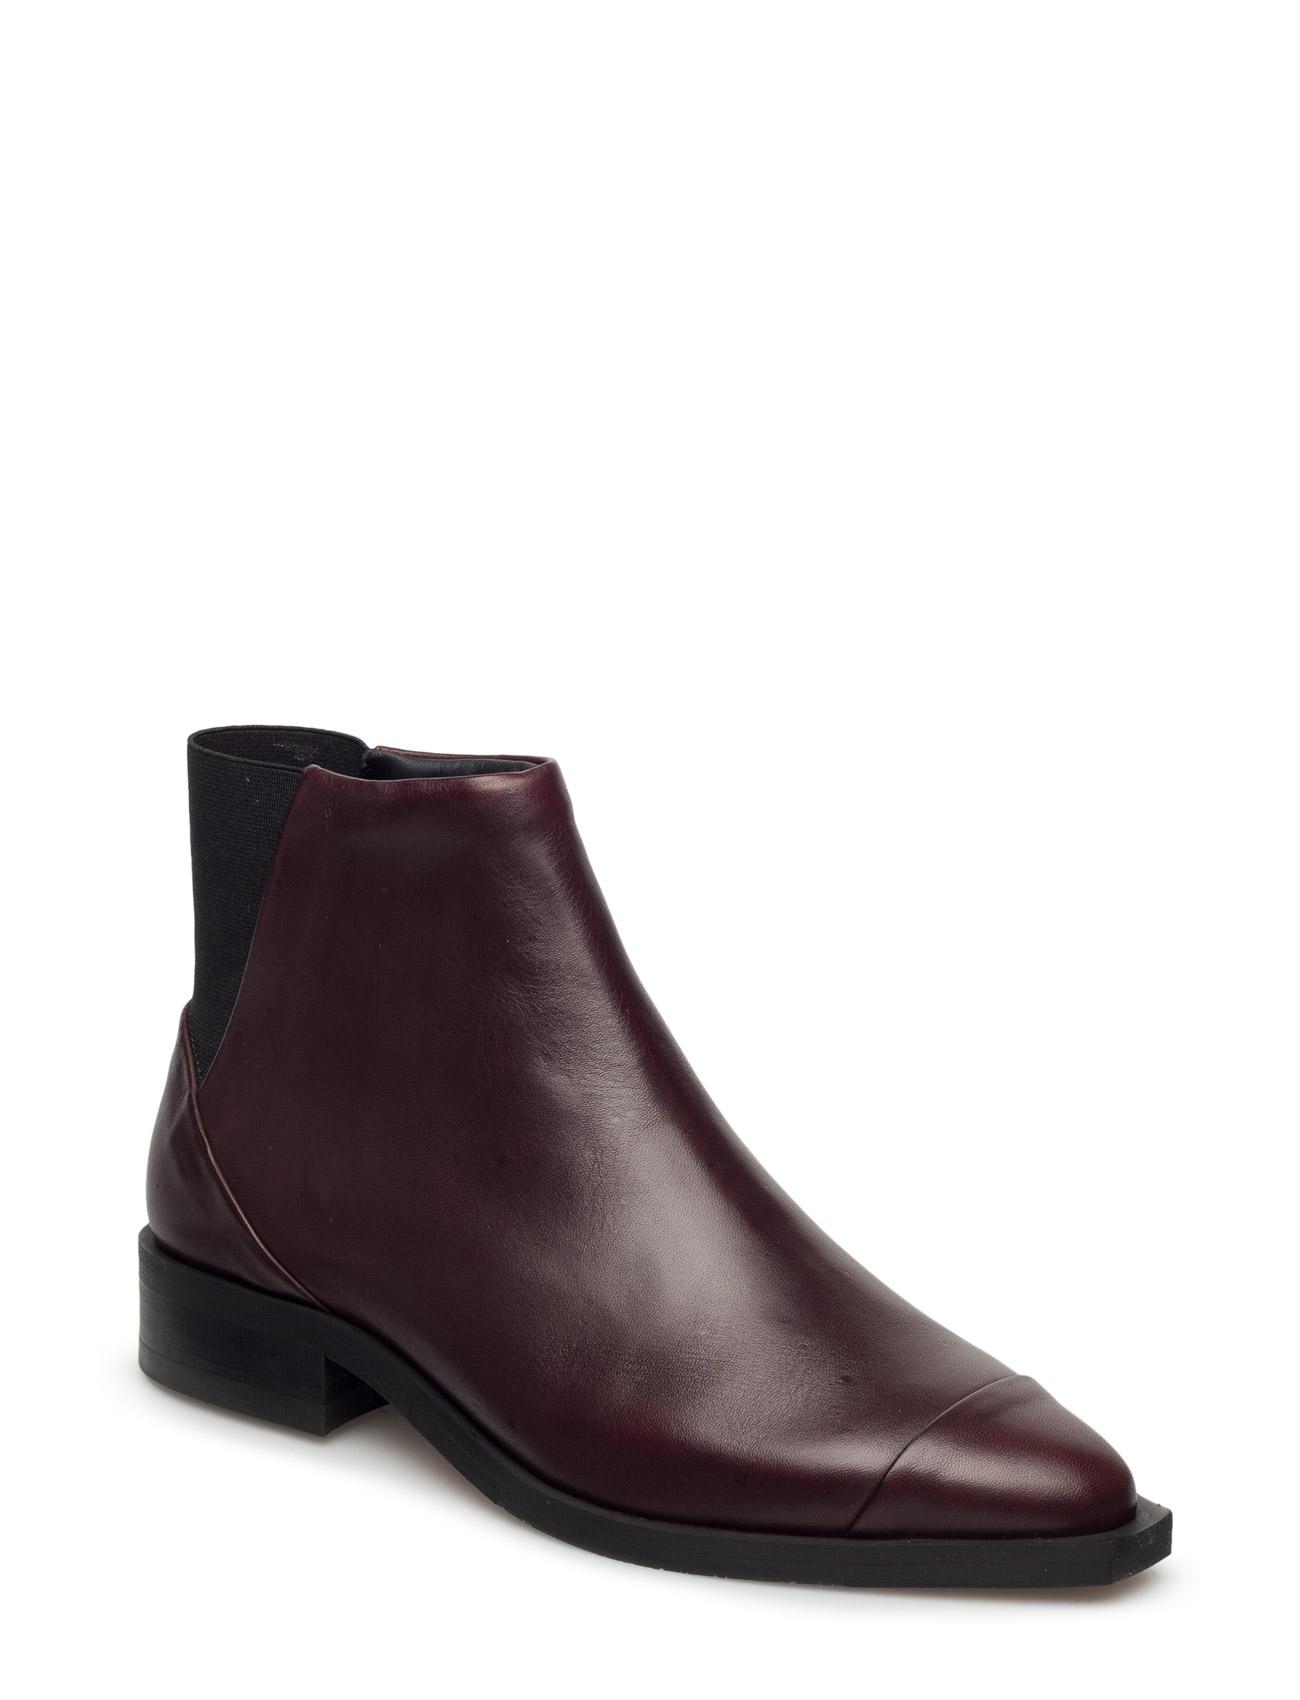 Prime Square Back Chelsea Royal RepubliQ Støvler til Damer i Bordeaux